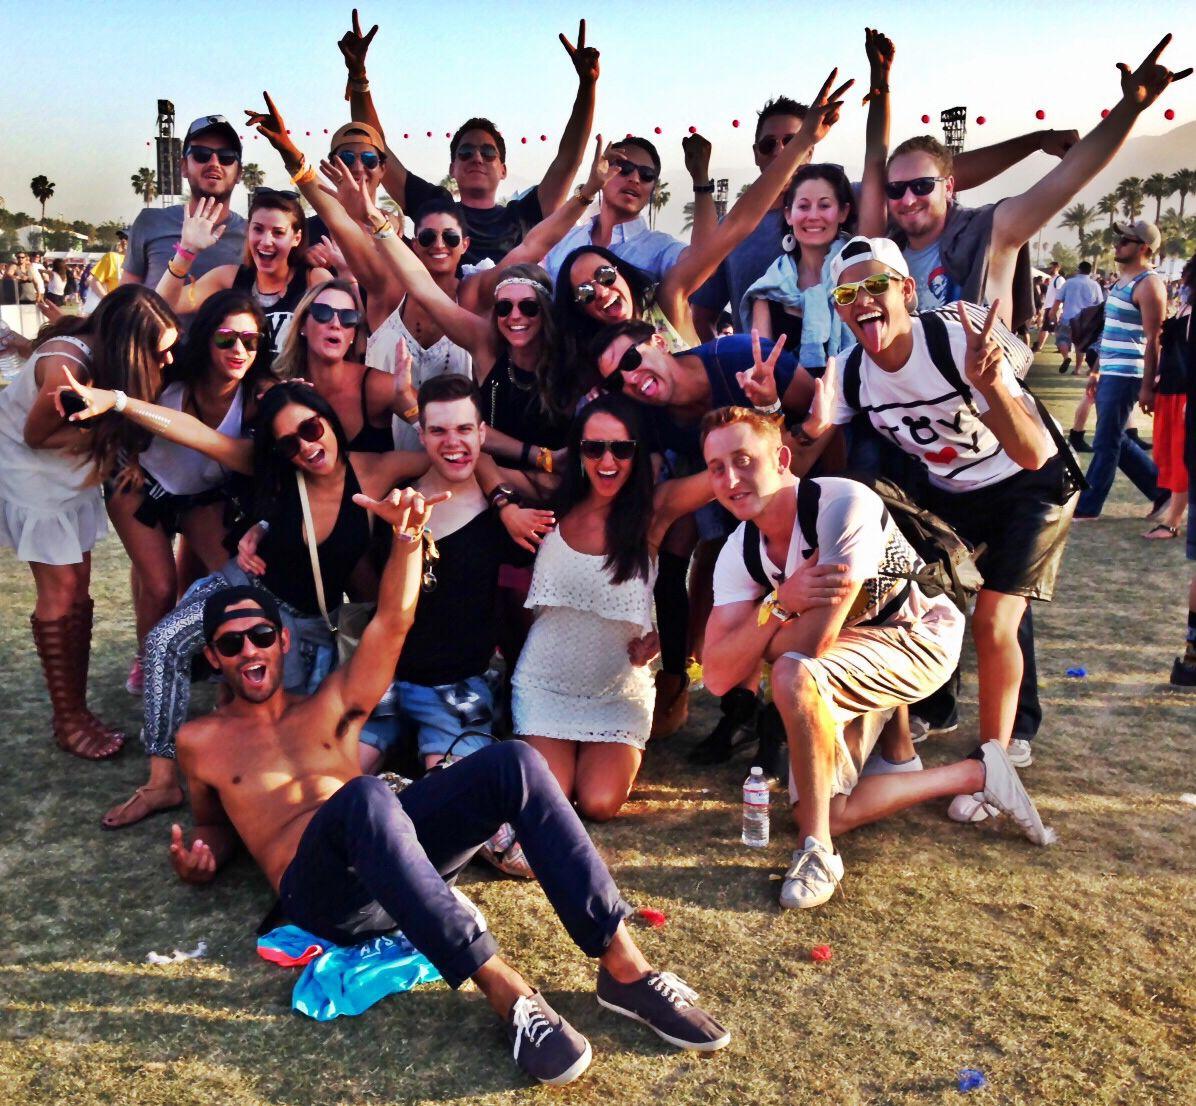 The Kids of #Coachella 2014! #tropicalacres